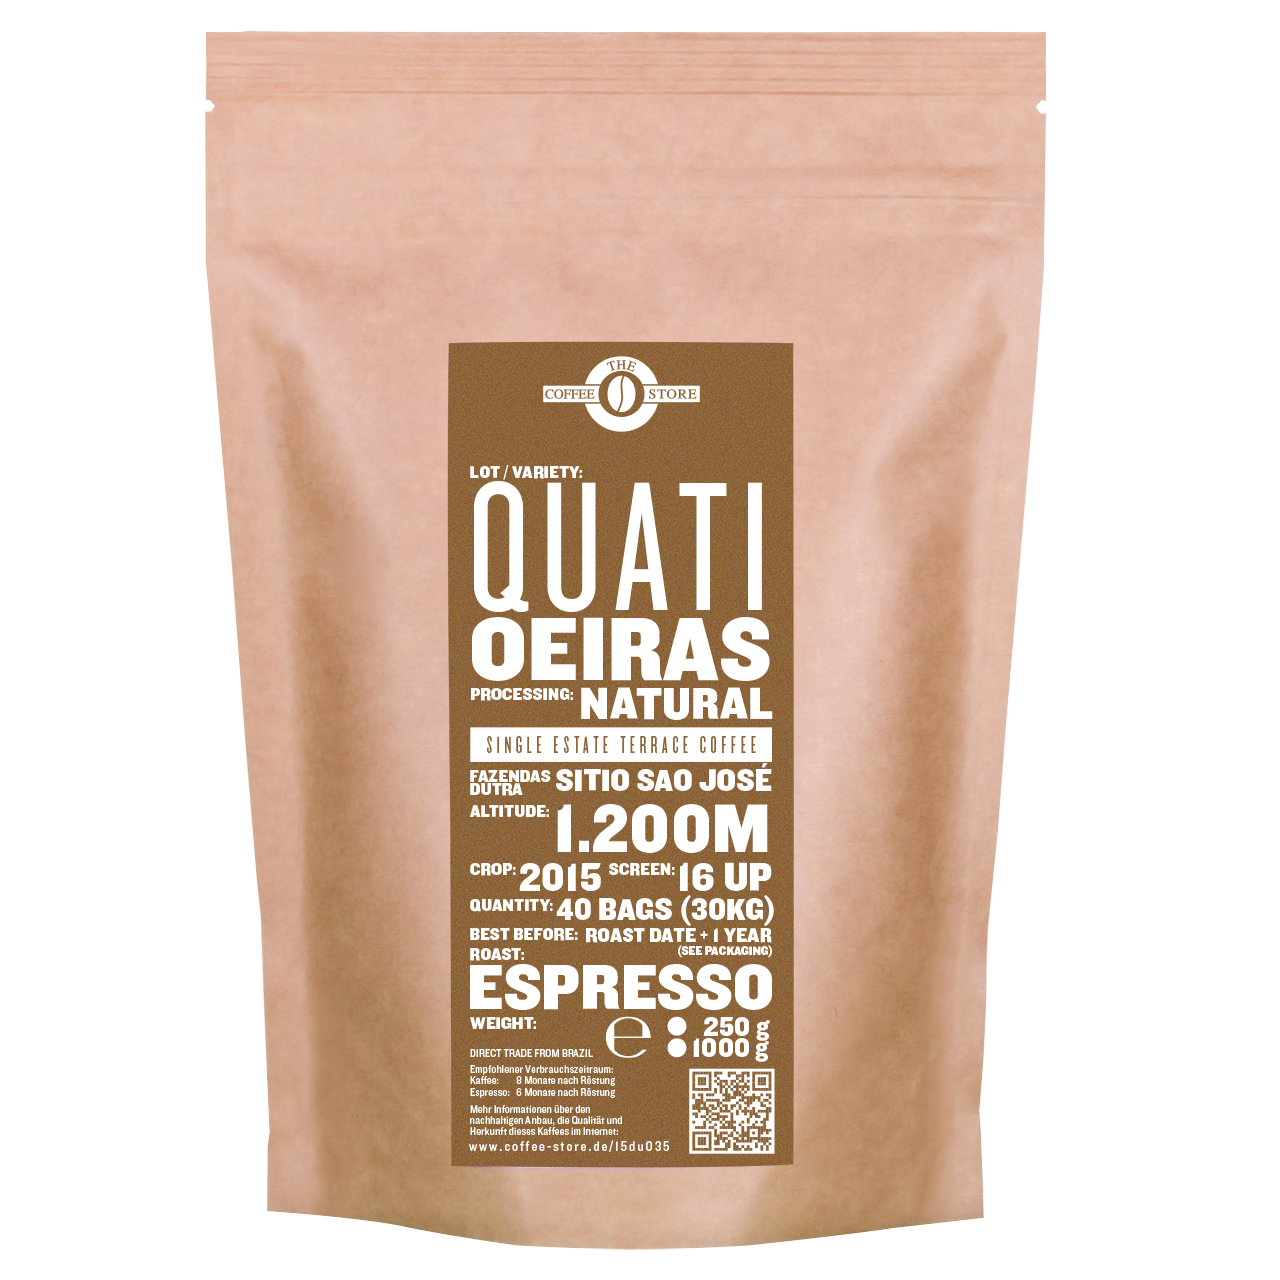 Quati, Oeiras - Espressoröstung